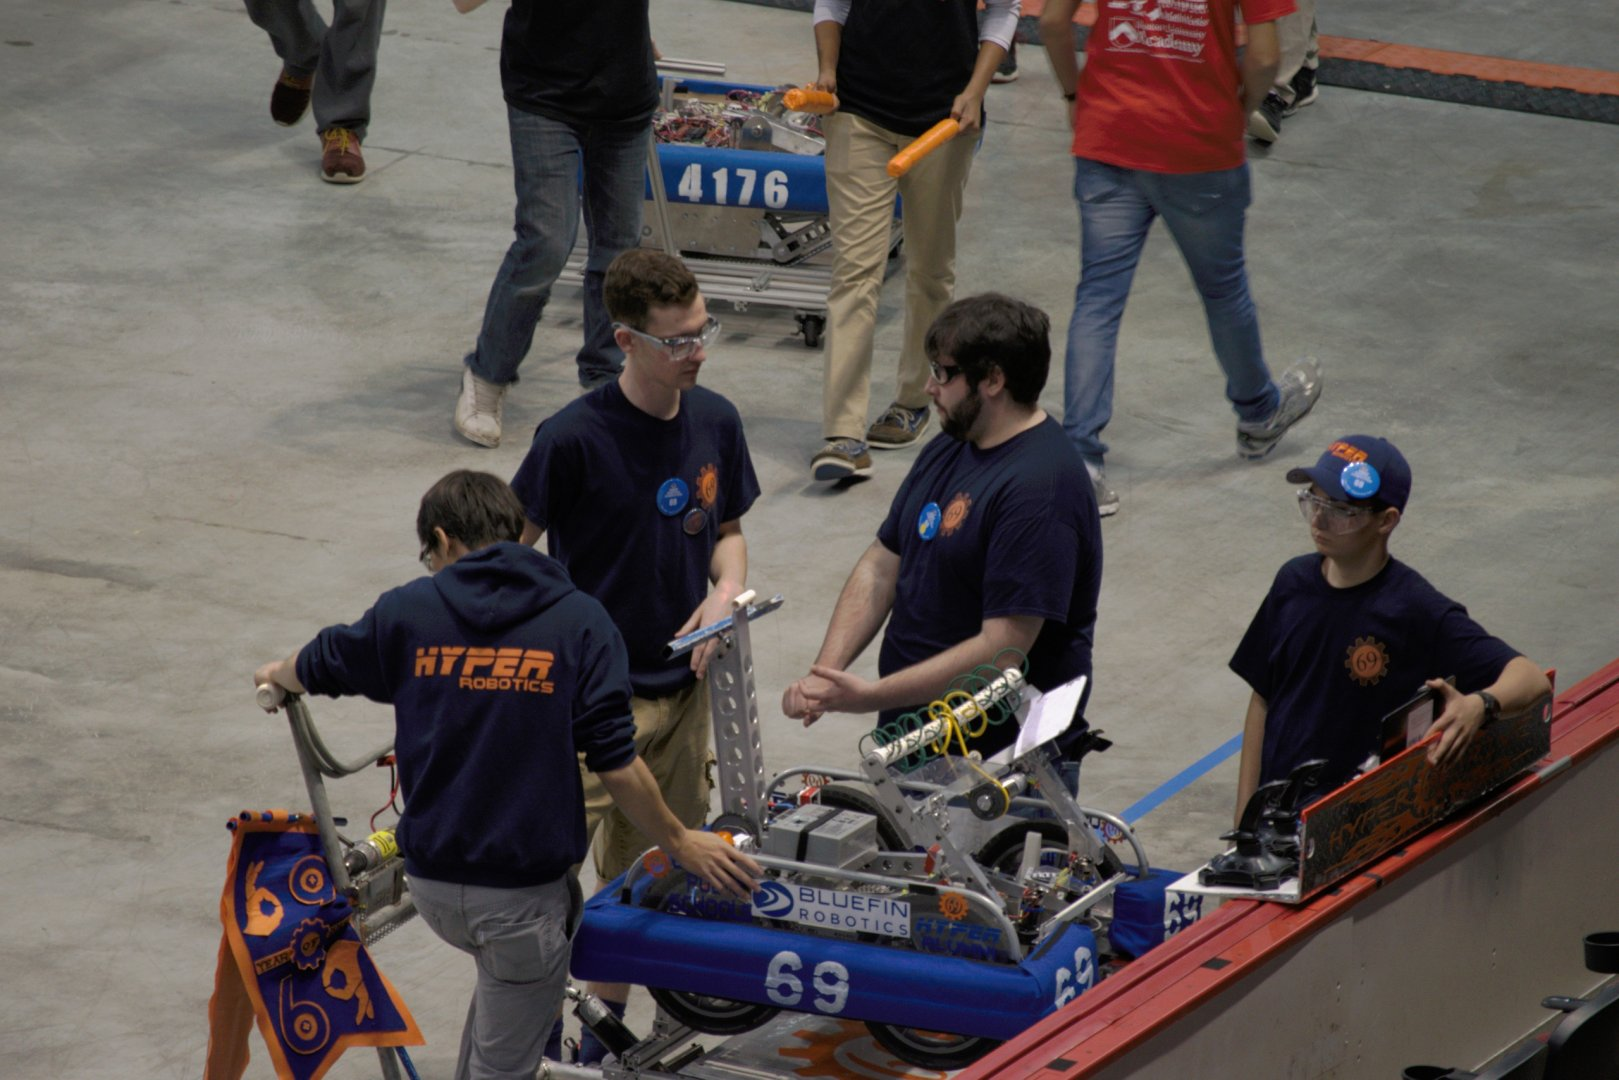 076.Boston FIRST Robotics Competition 04-03-2016.jpg